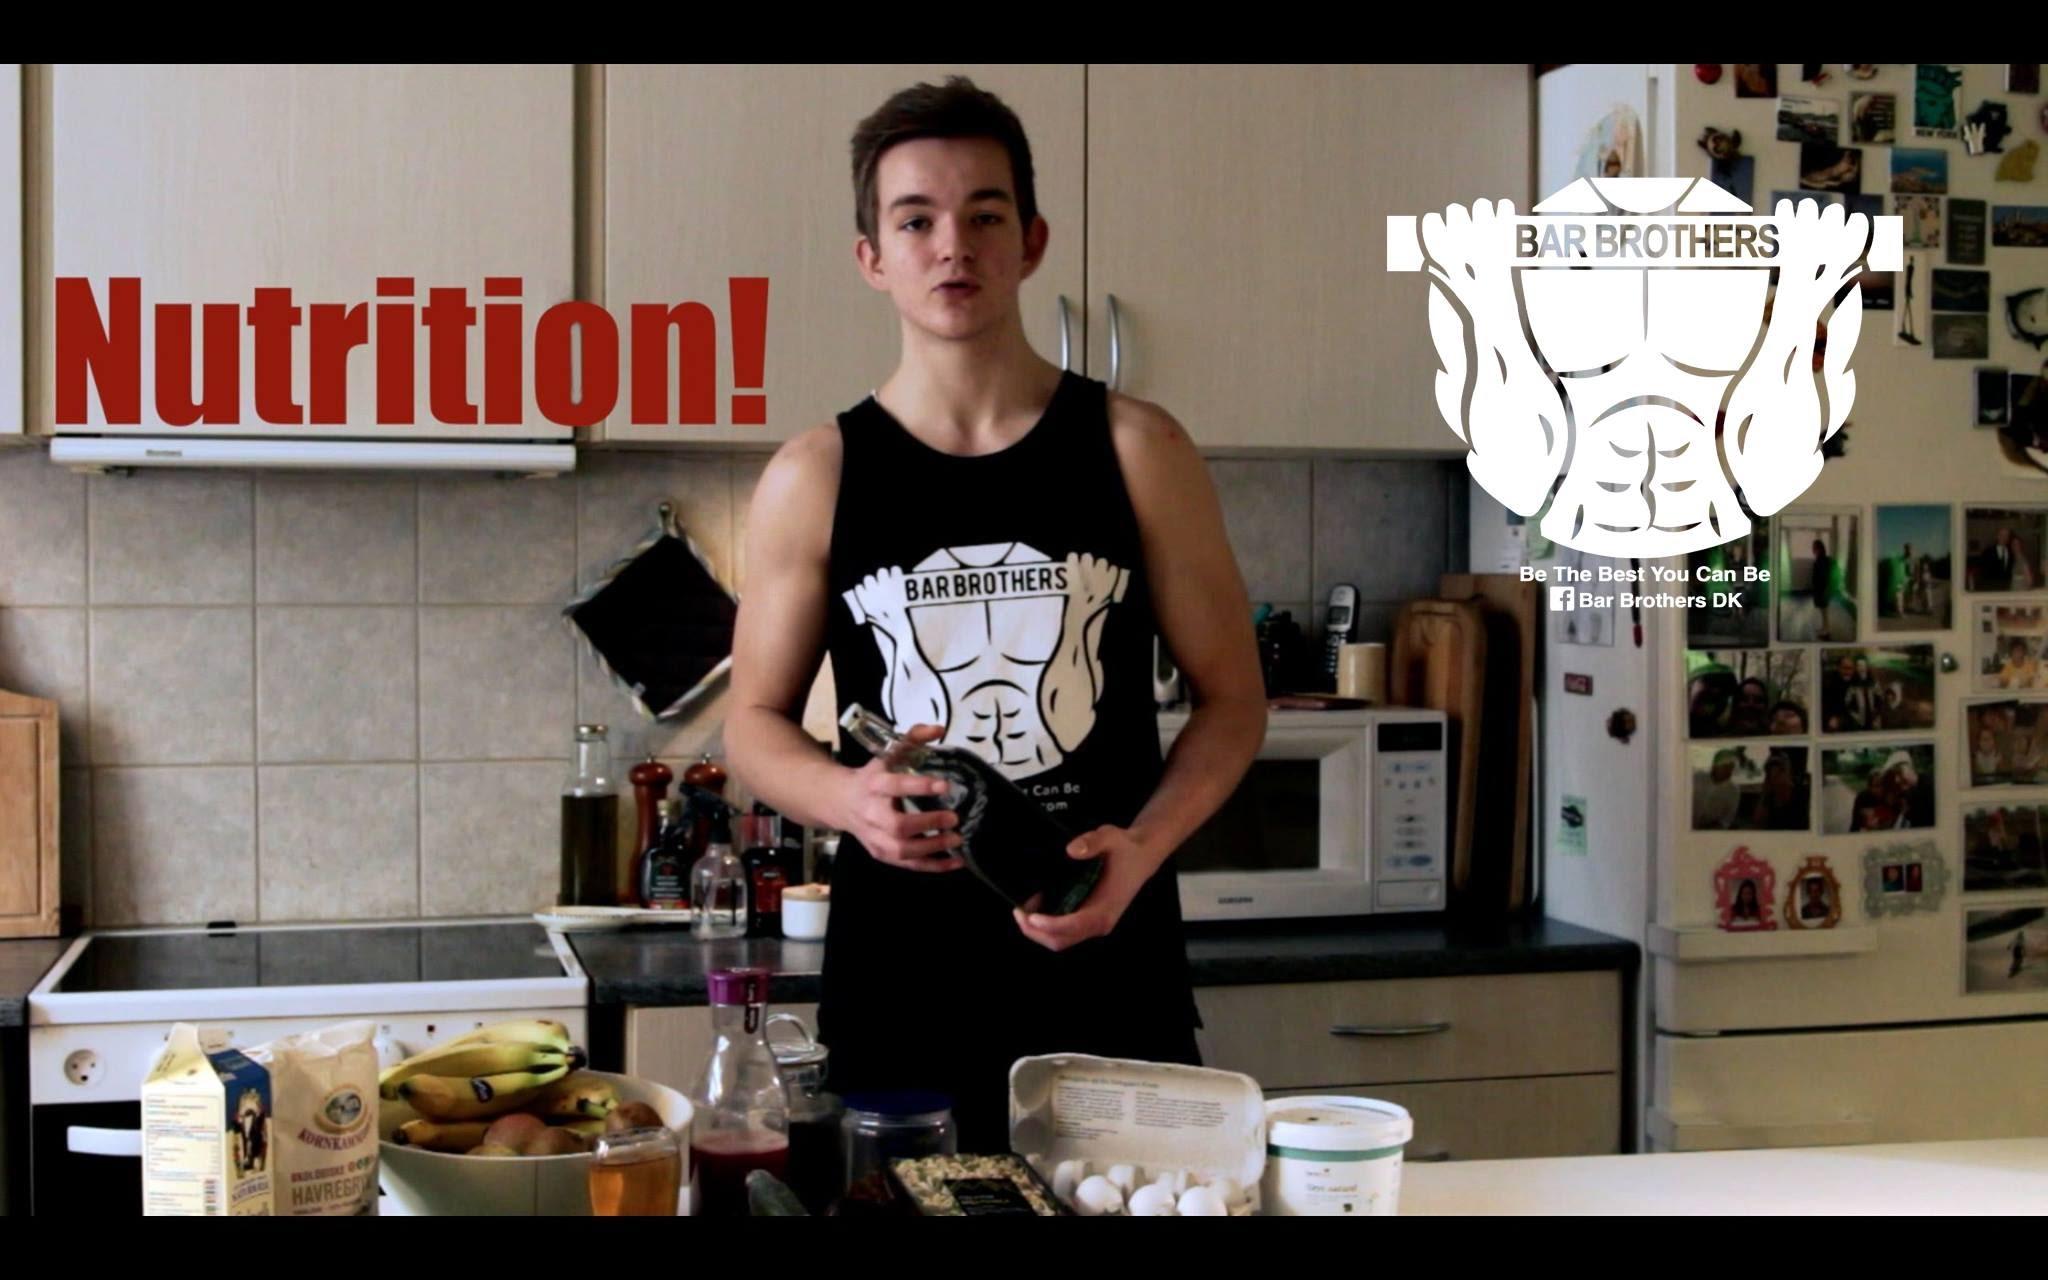 Charmant Nutrition Guide (Food)   Beginners, Teenagers   Bar Brothers DK  (Calisthenics)